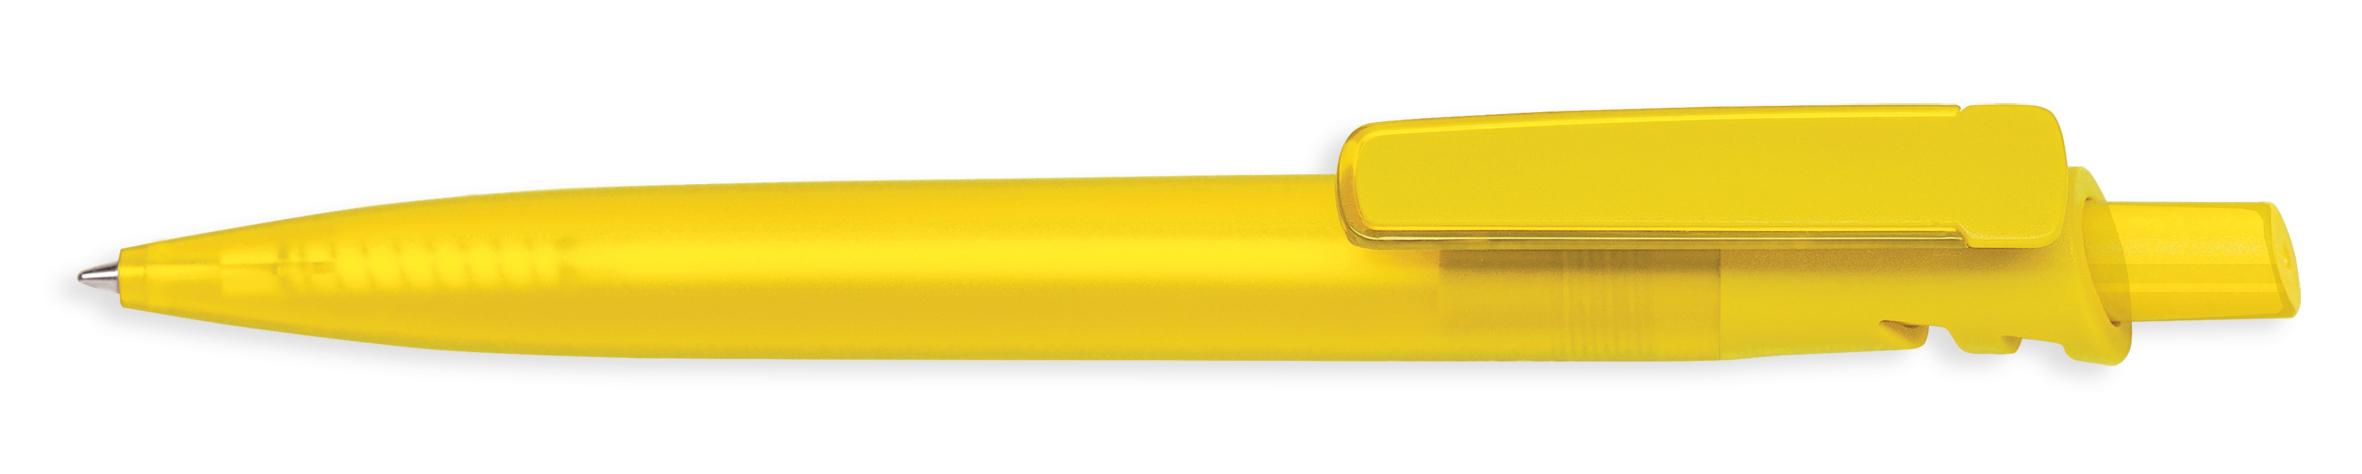 GRAND_TS_yellow